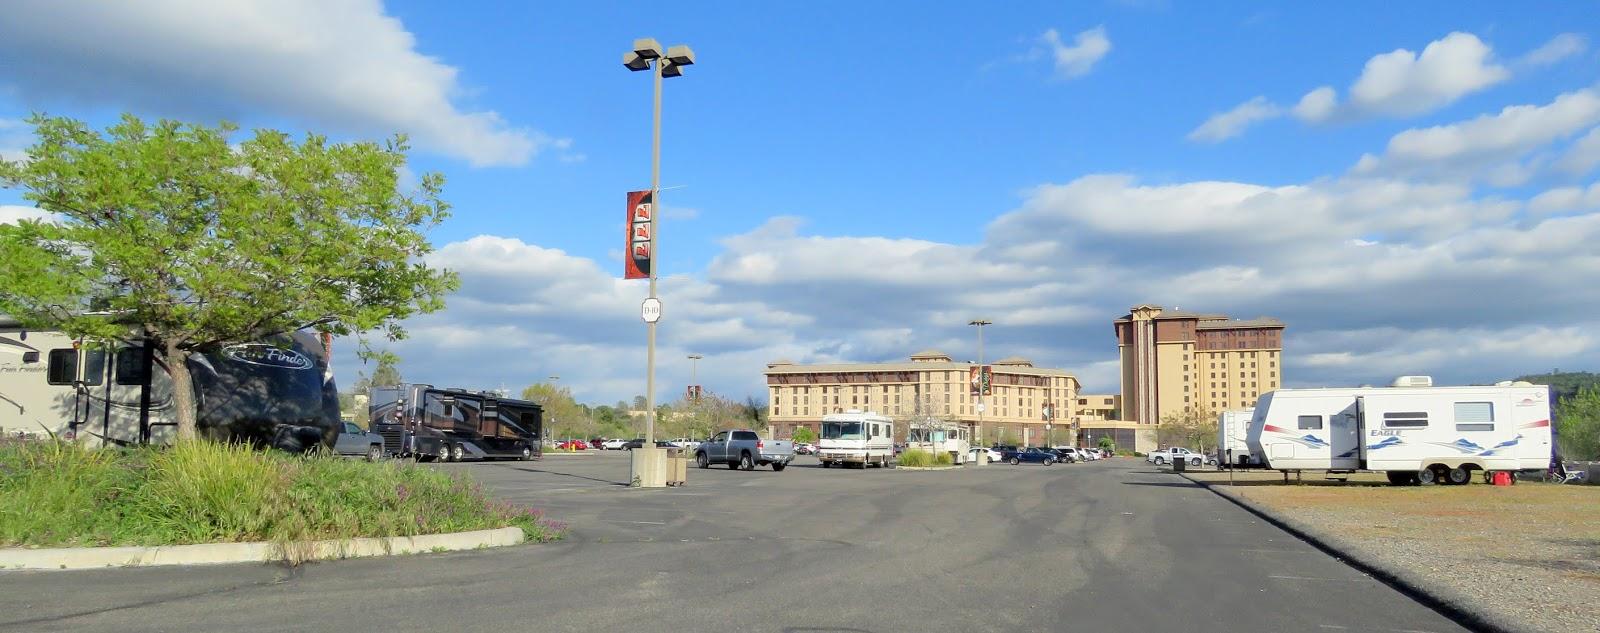 Rv parking at chukchansi casino play game sonny 2 hacked